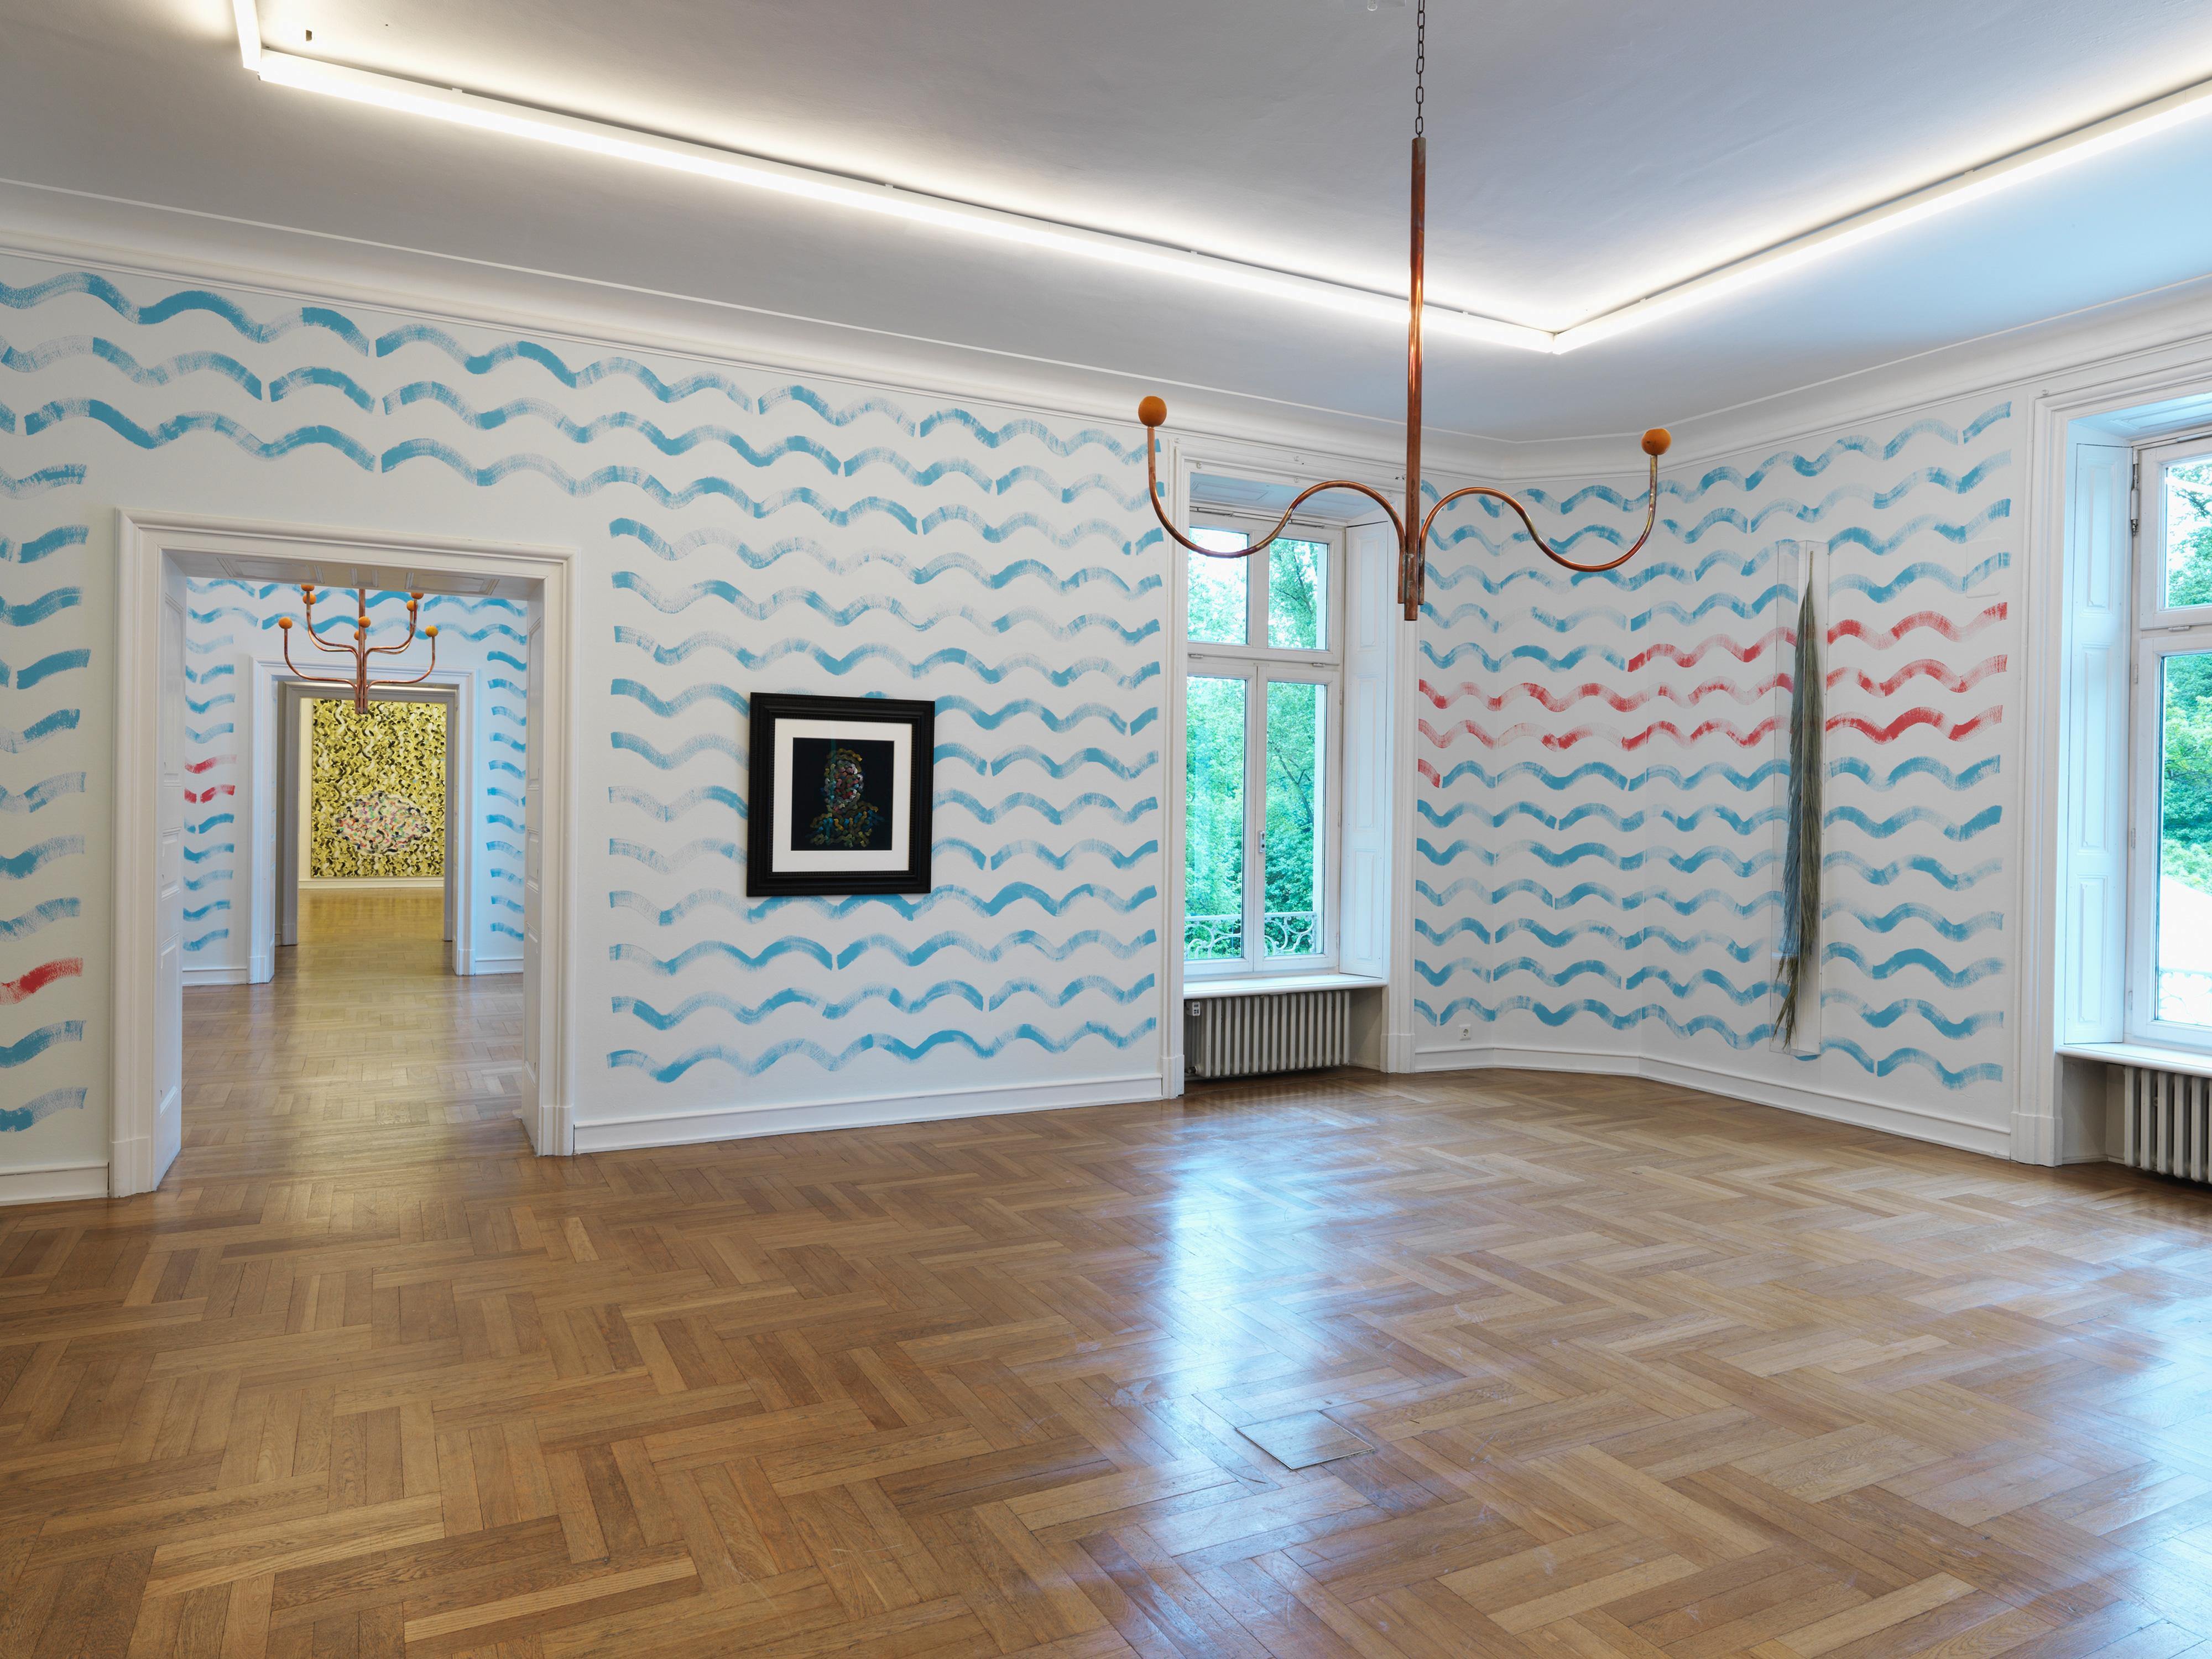 Galerie Barbara Thumm \ Diango Hernández – Theoretical Beach – Museum Morsbroich, Leverkusen